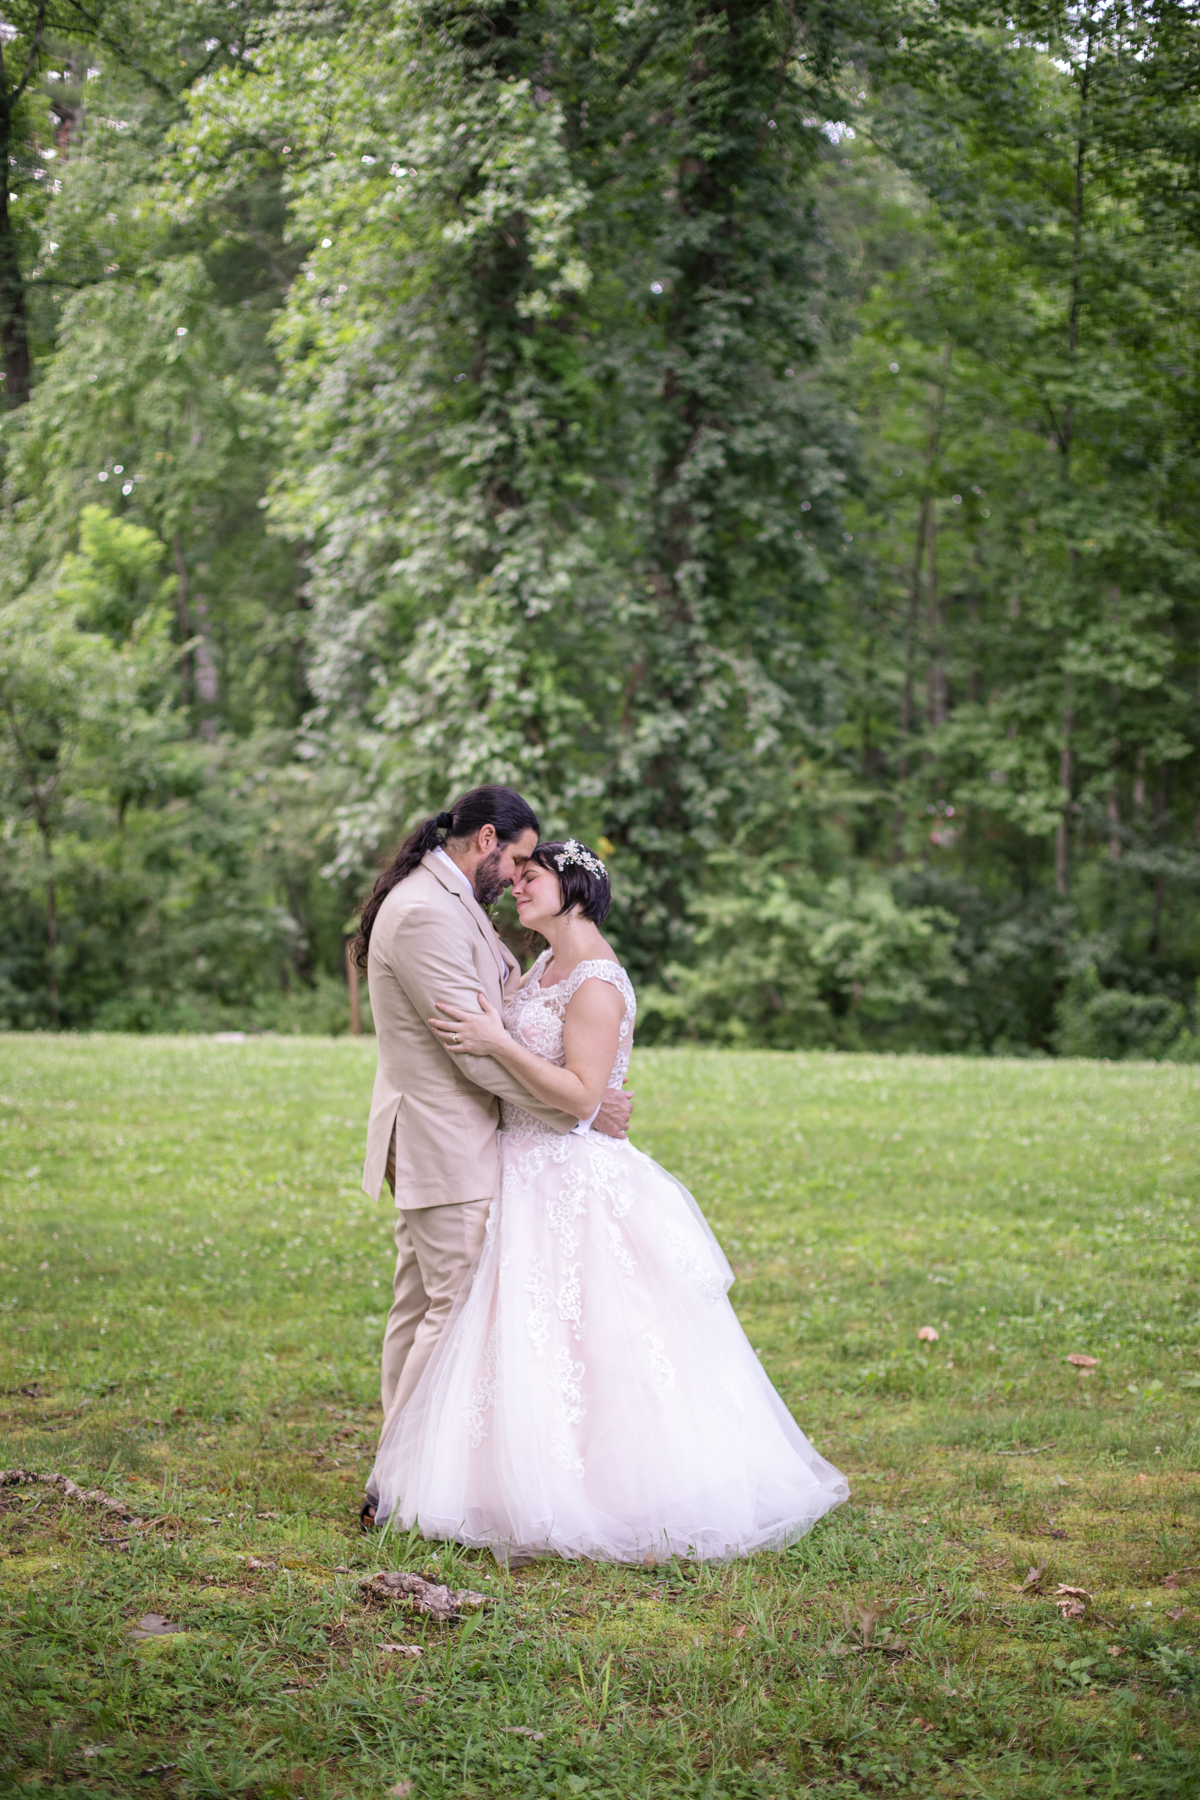 Avyanna and Phoenix Wedding 2019_photos by Studio Misha_BLOG-178.jpg